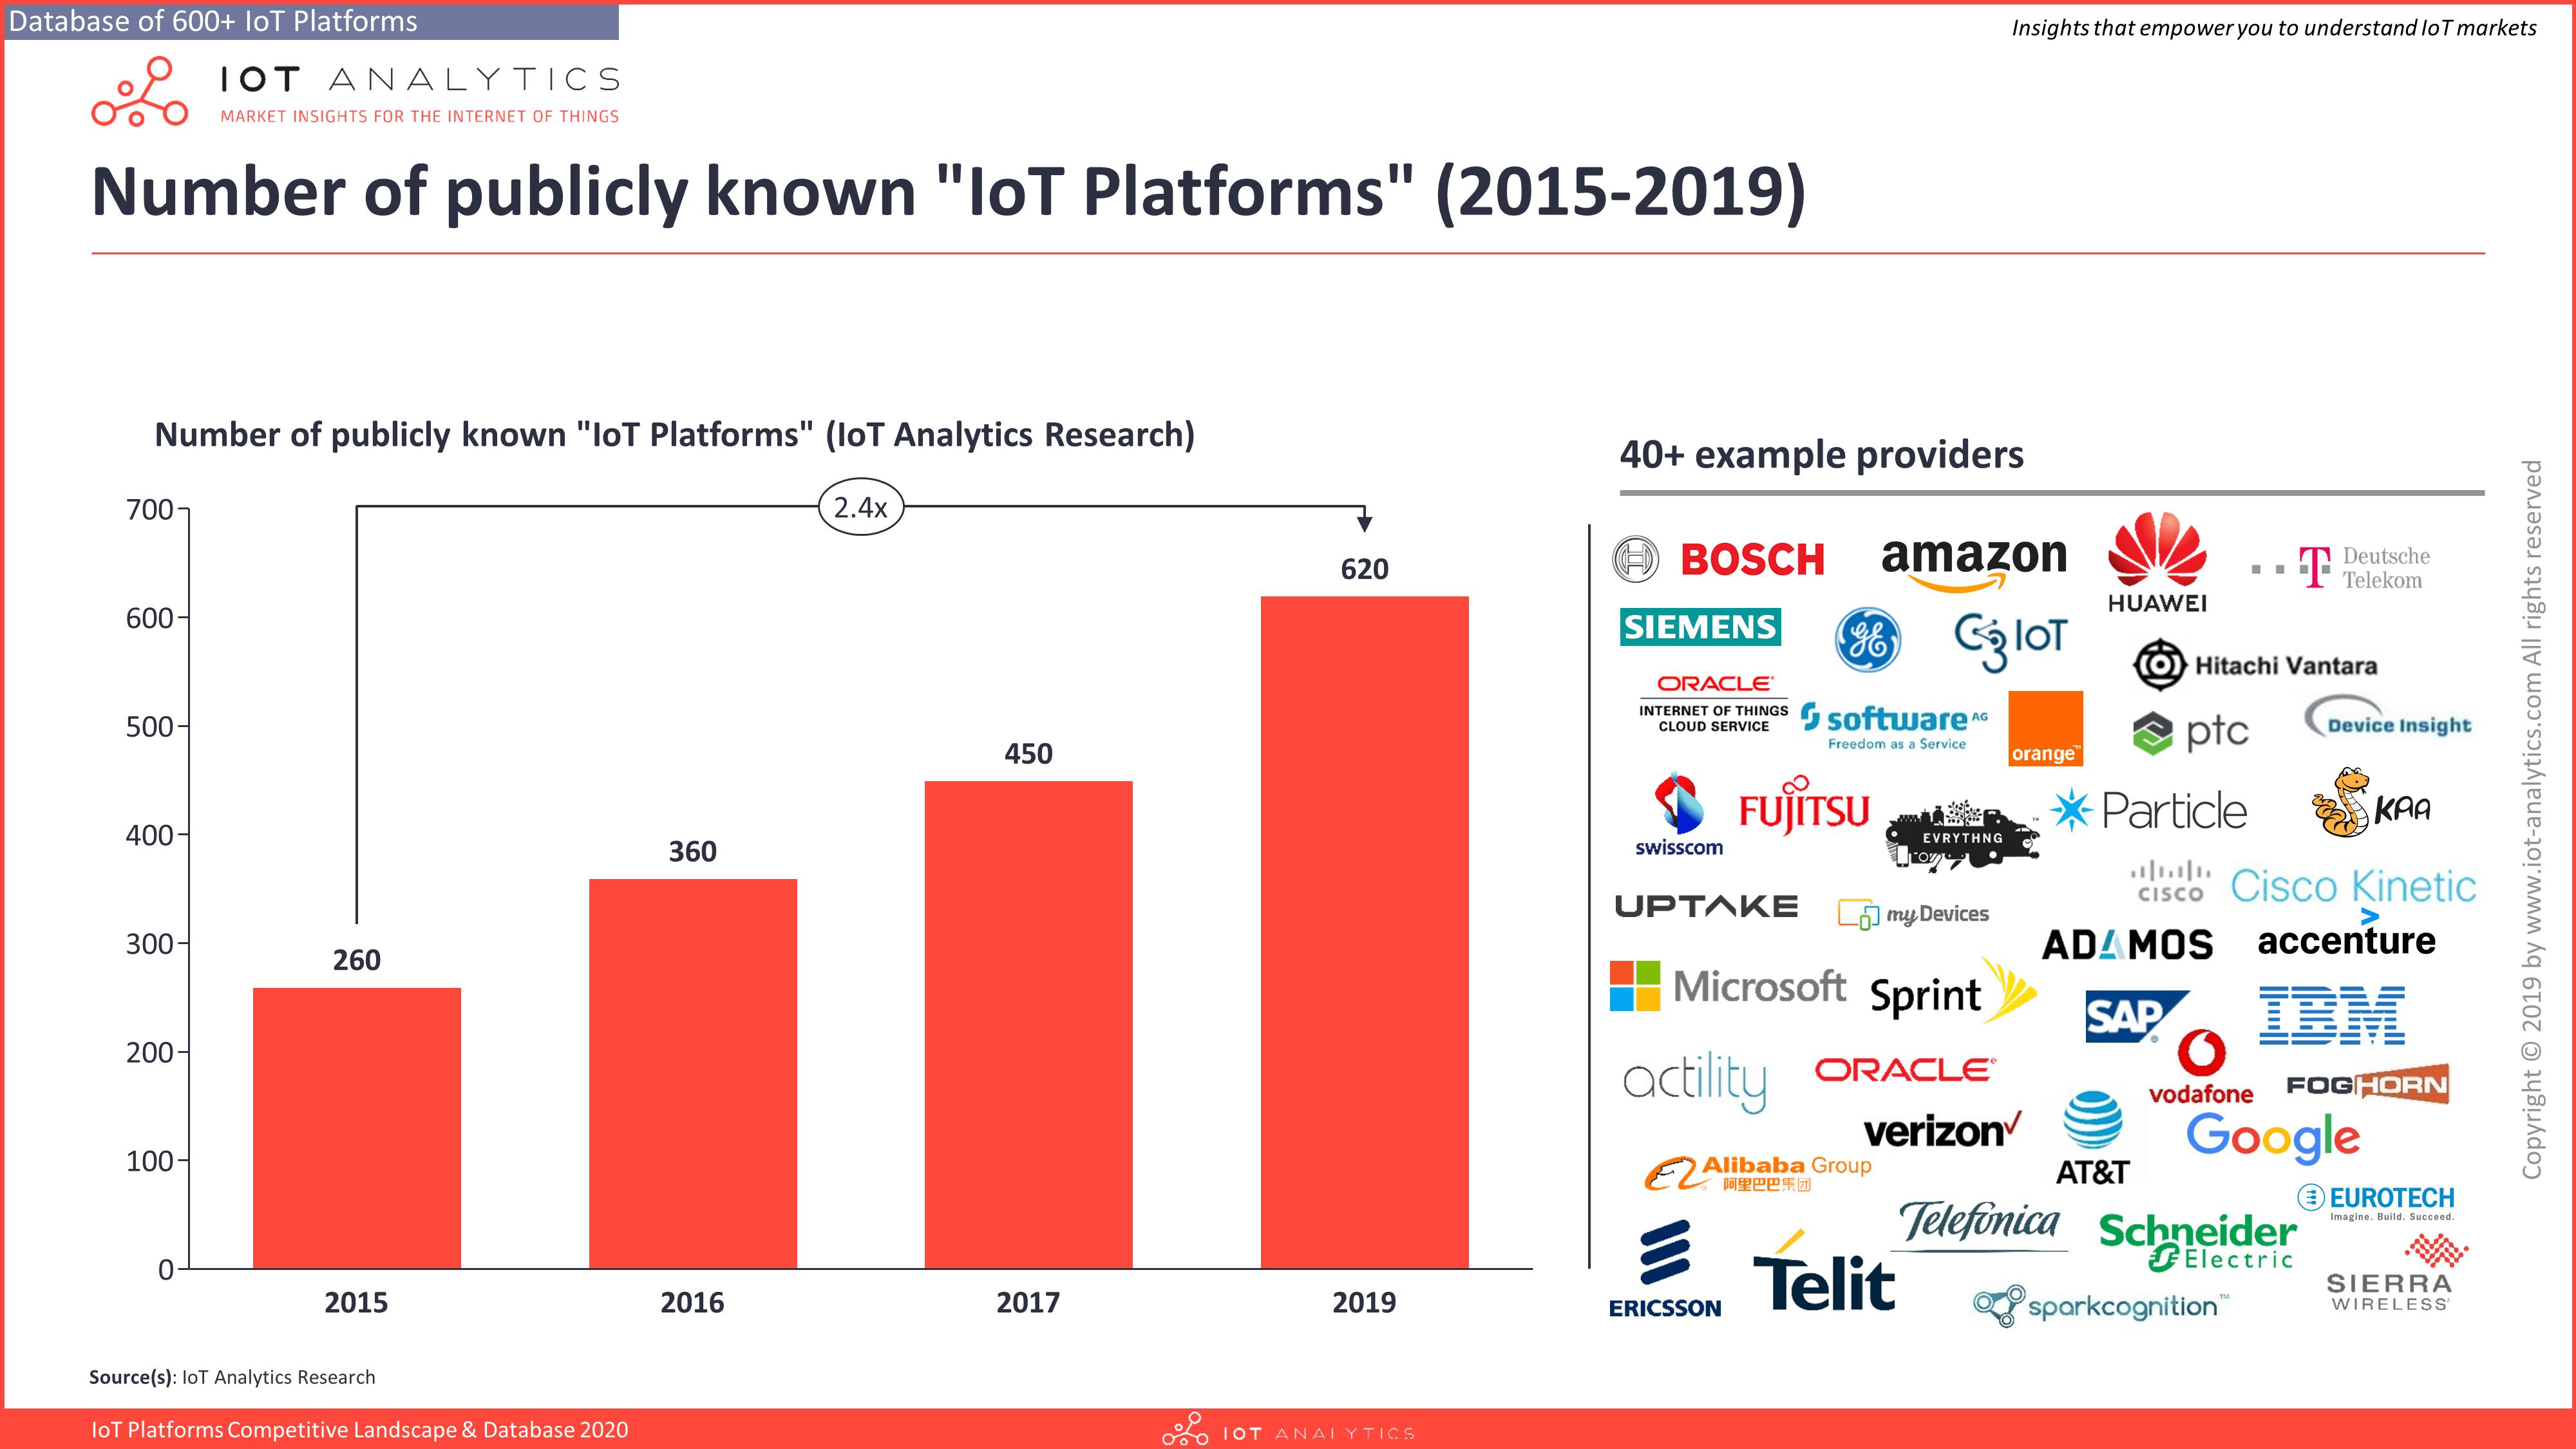 IoT Platforms Company Landscape & Database 2020 - 620 platforms-min